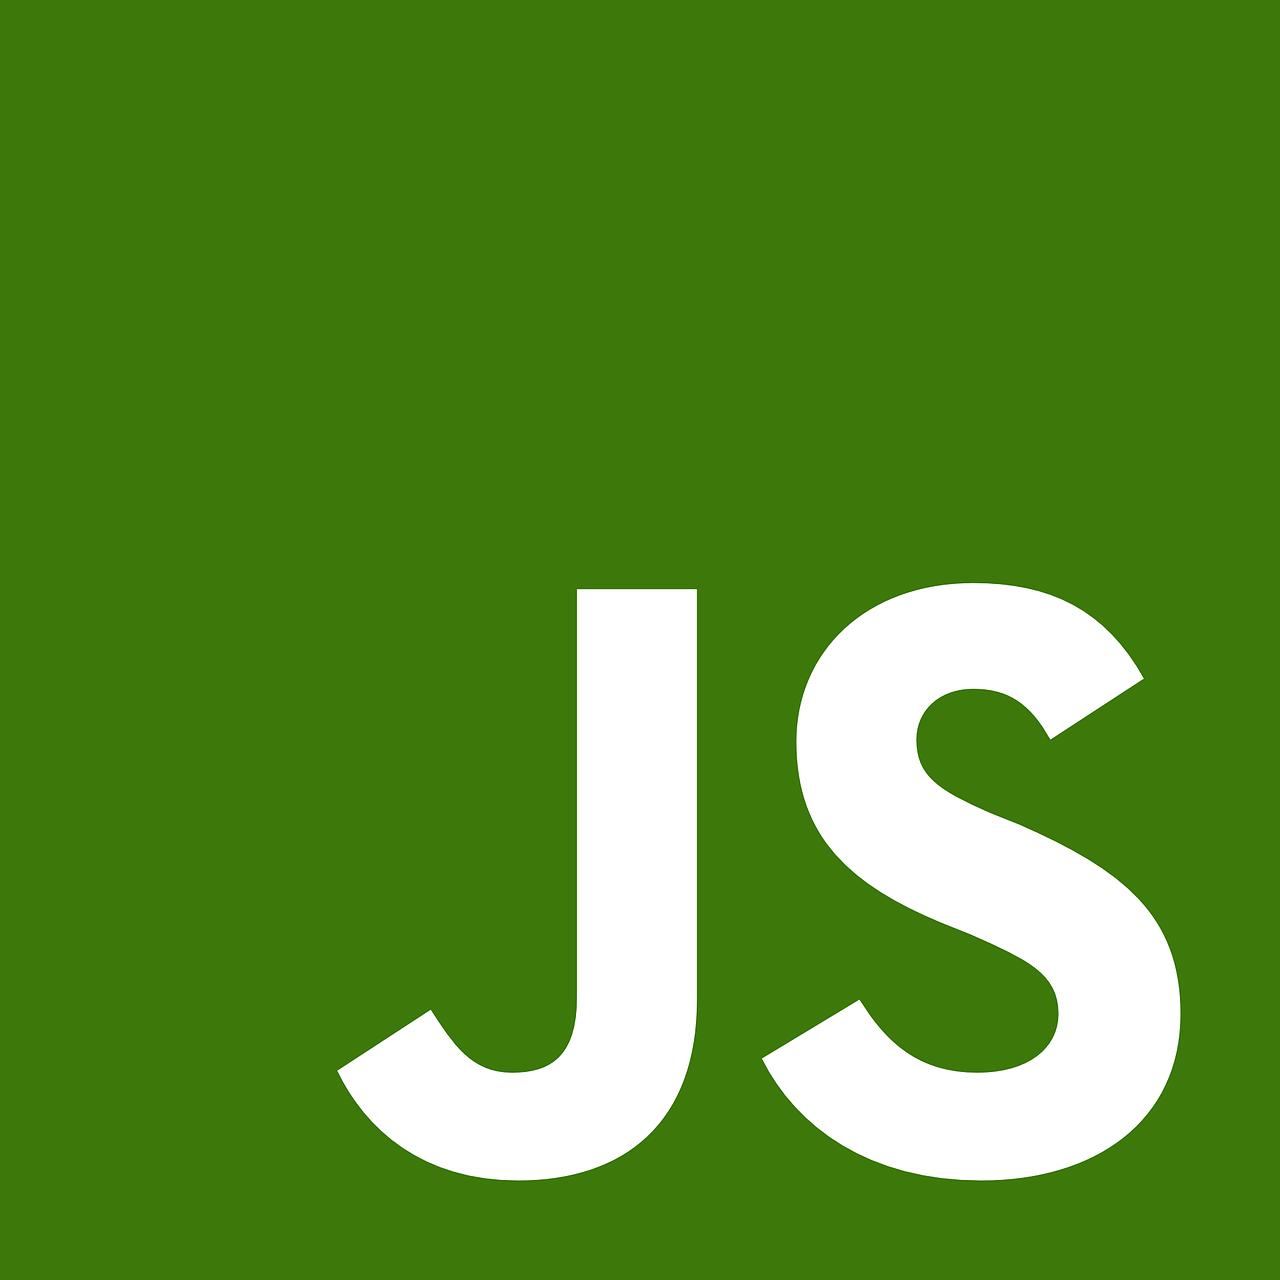 V8 8.0 JavaScript引擎降低堆内存40%,添加语言特性Optional Chaining和Null Coalescing